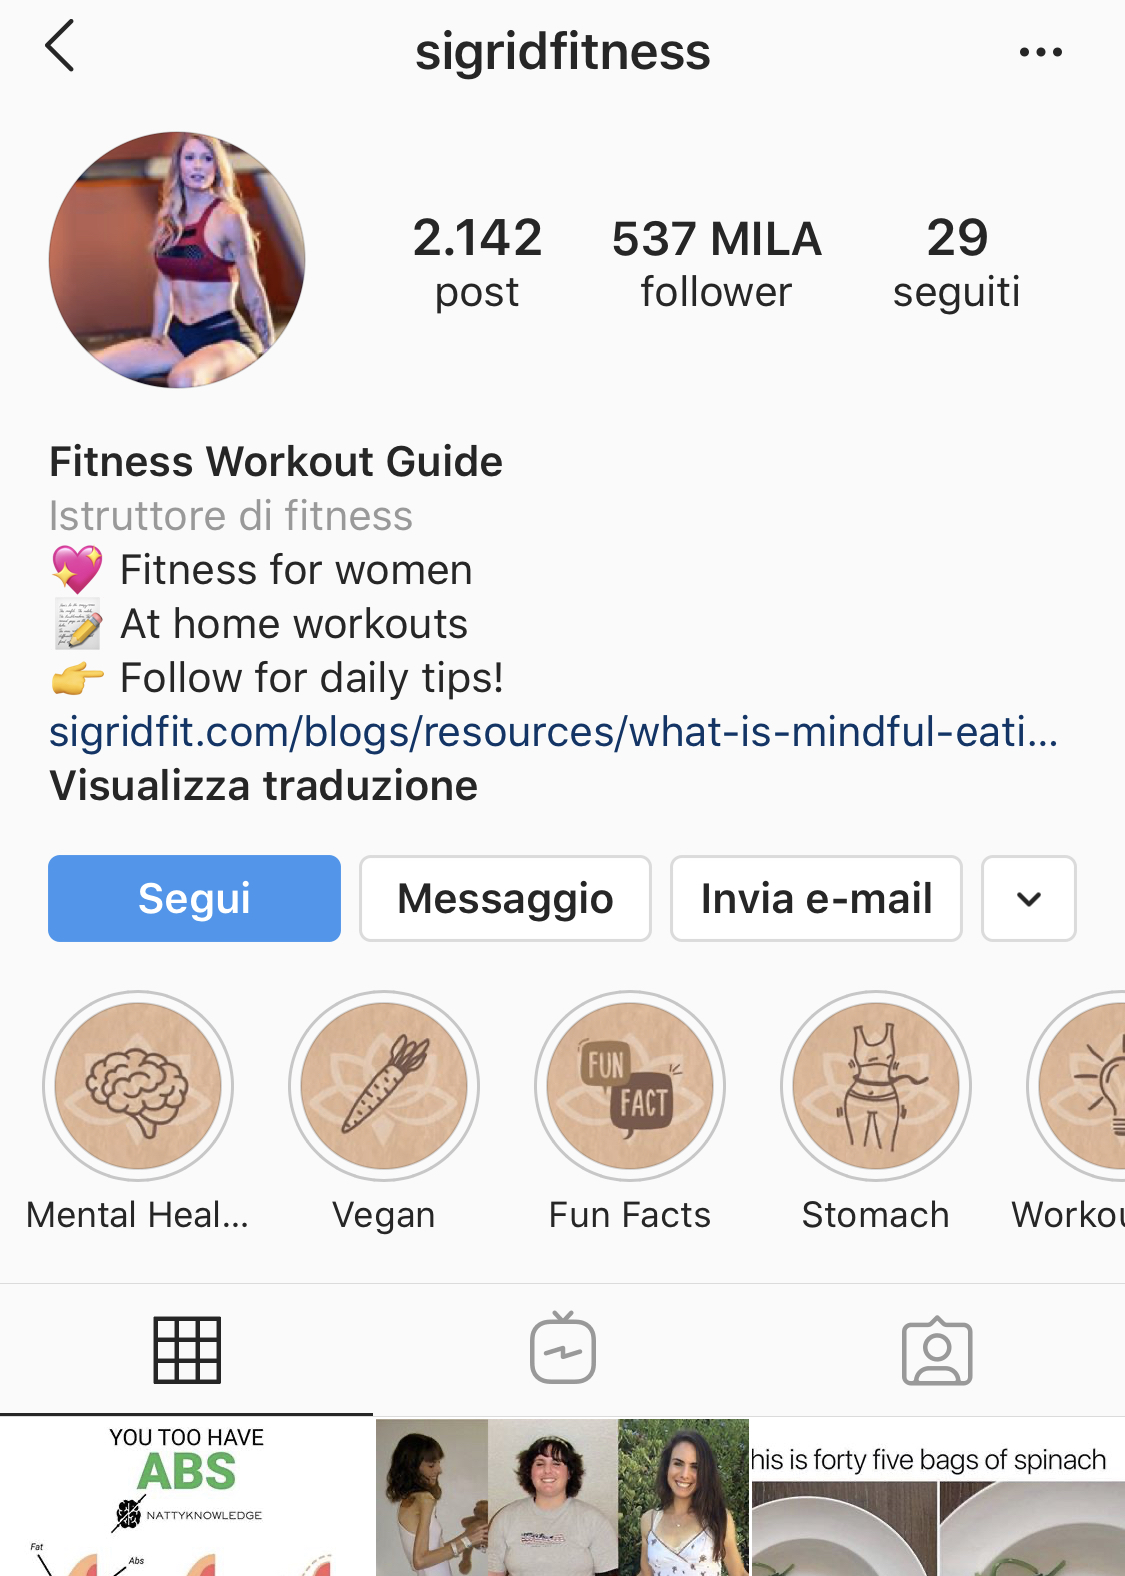 Highlights_delle_Instagram_Stories_rosariatriestino4